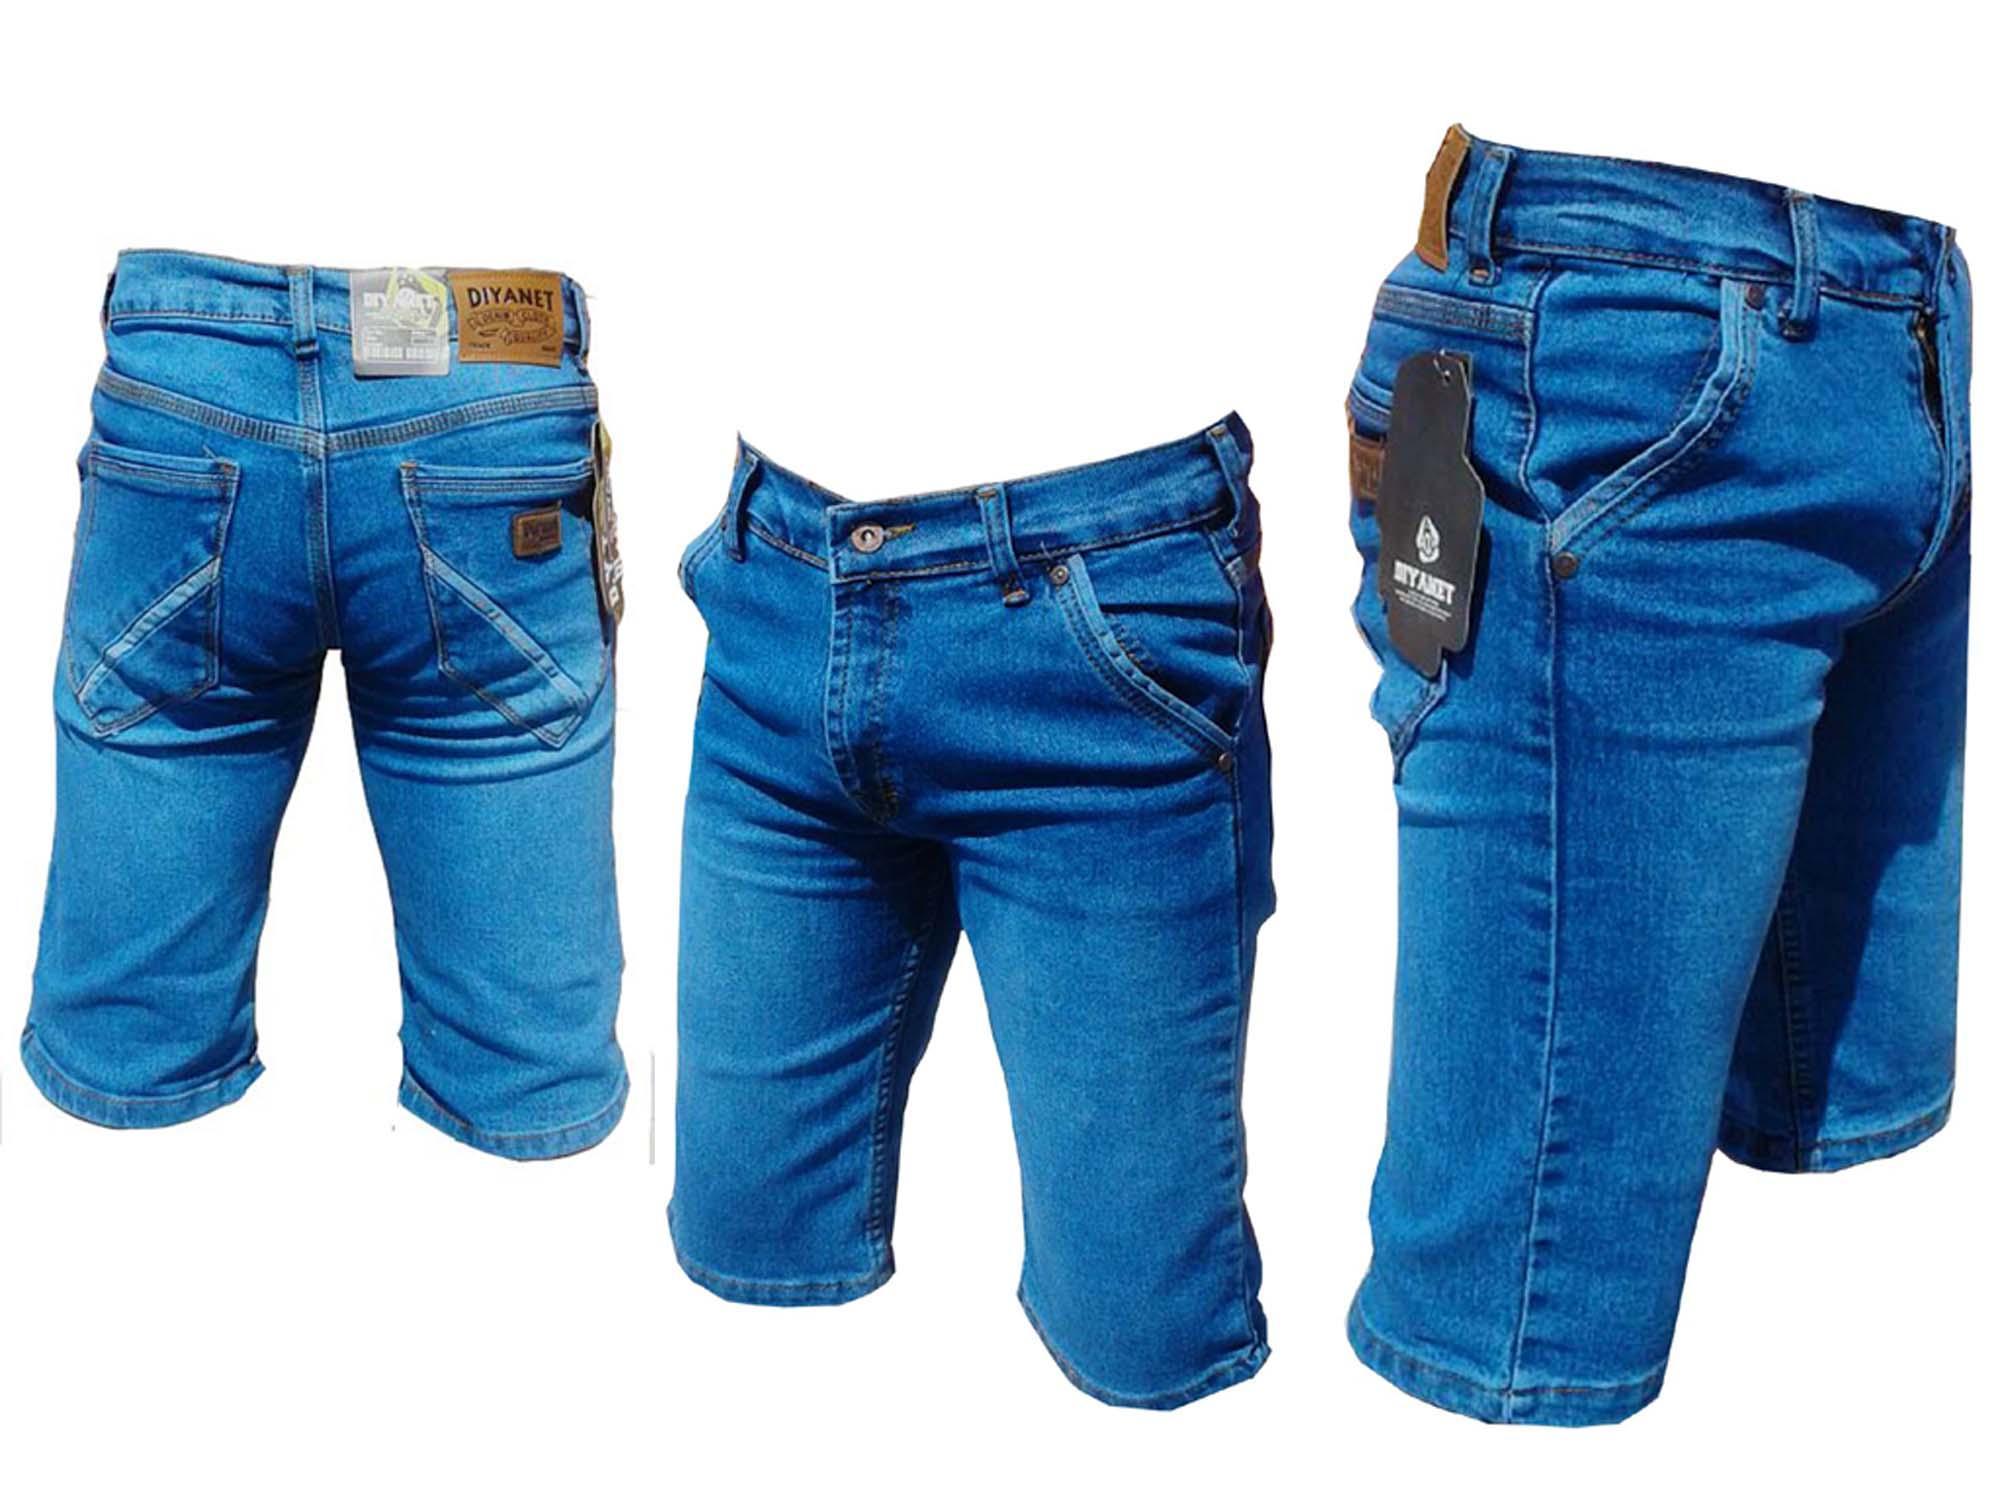 Fitur Diky Noval Celana Pria Cargo Blackhawk Tactical Outdoor Jeans Pendek Trendy Size 27